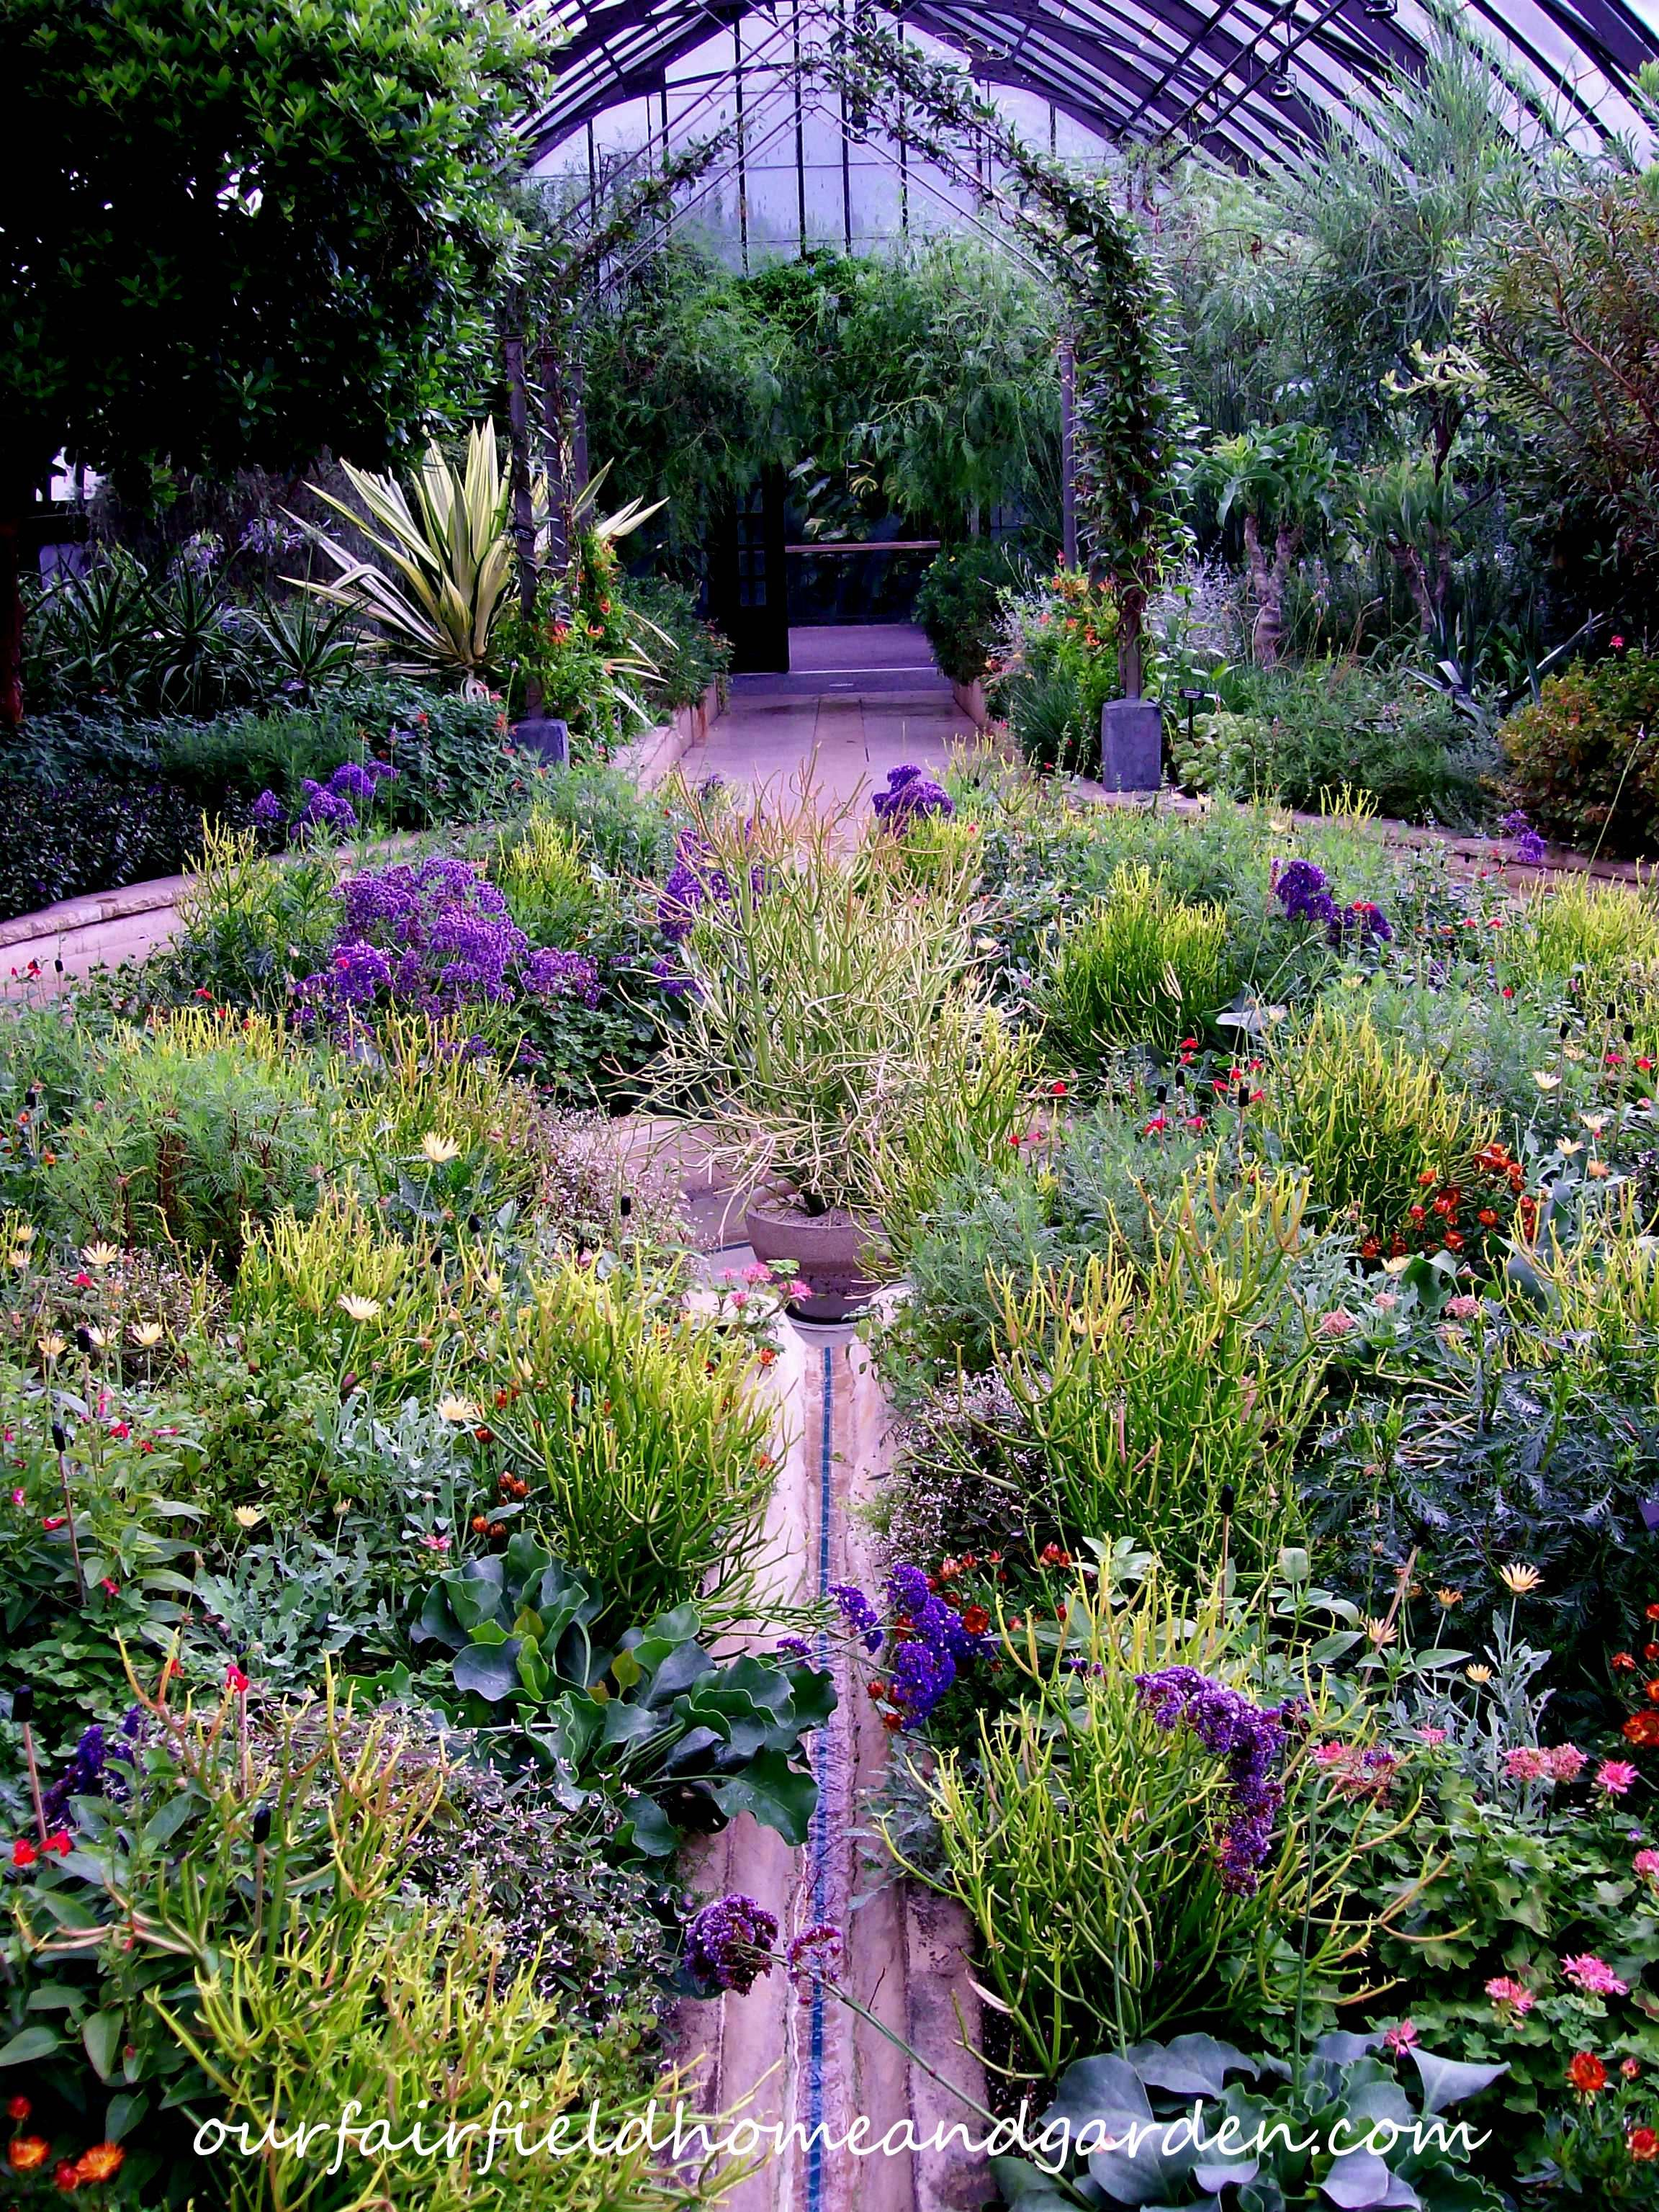 Alison S Gardens Mediterranean Garden: Longwood Gardens Tour ~ Mediterranean Garden